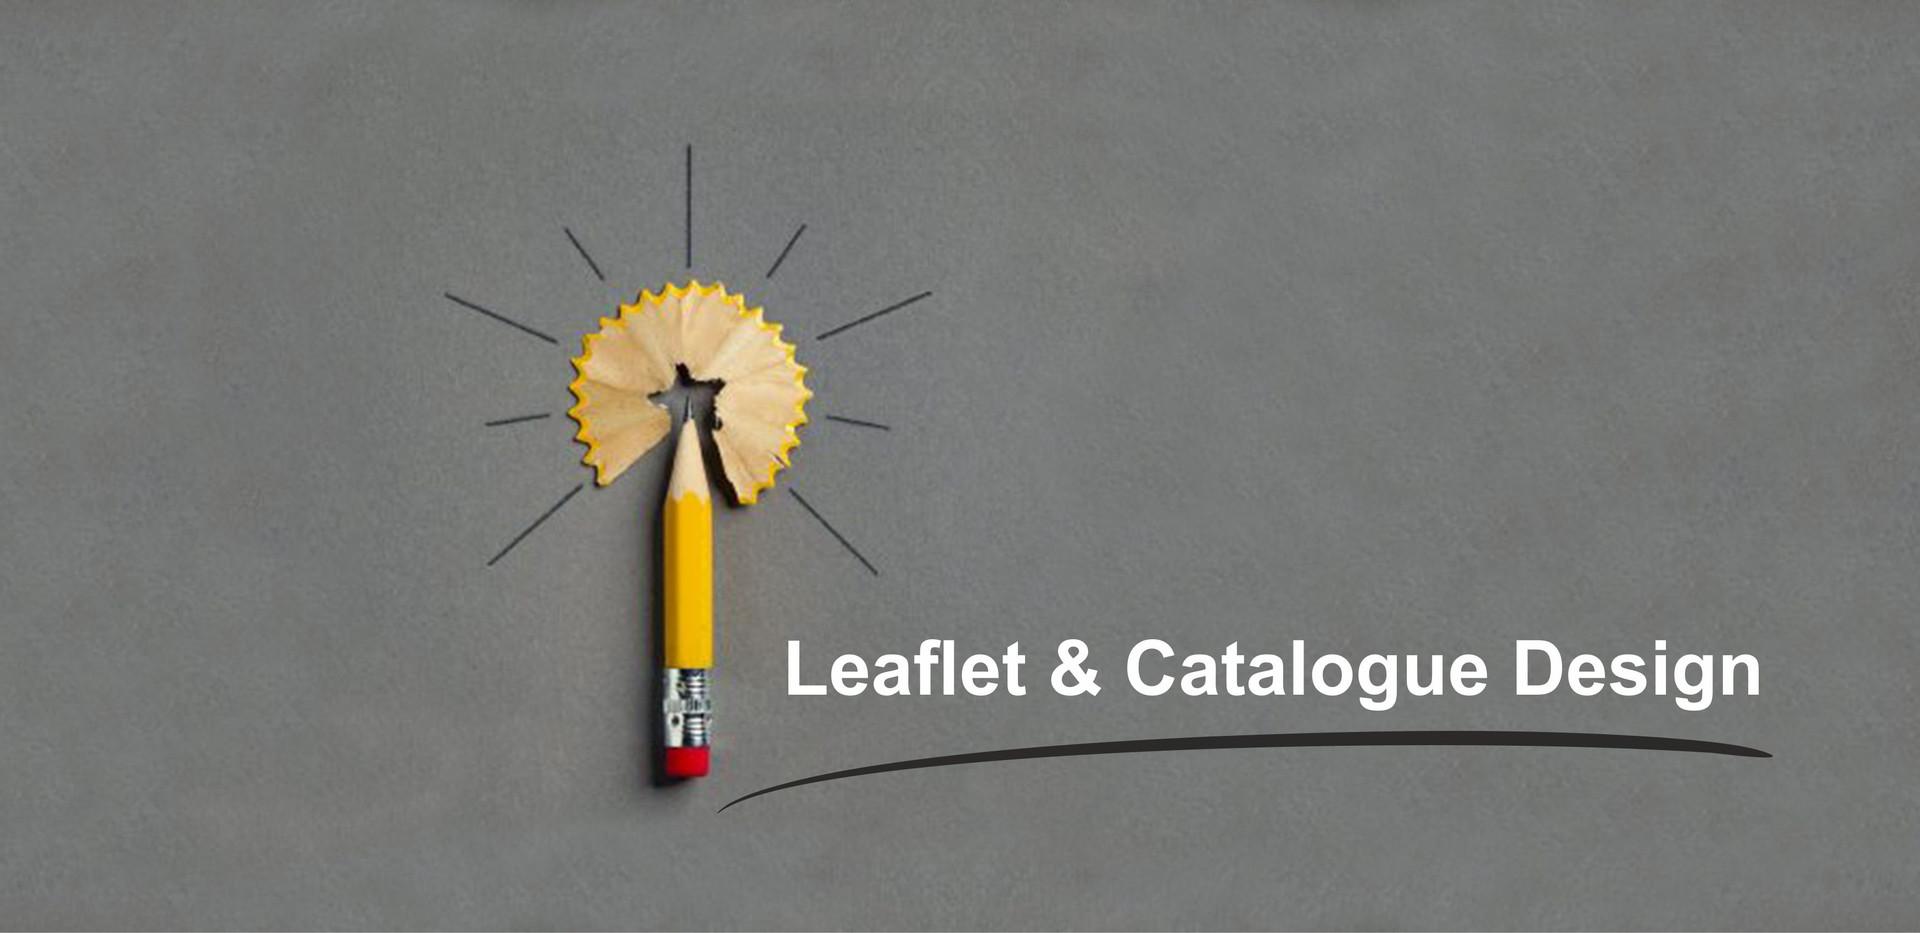 LEAFLET & CATALOGUES